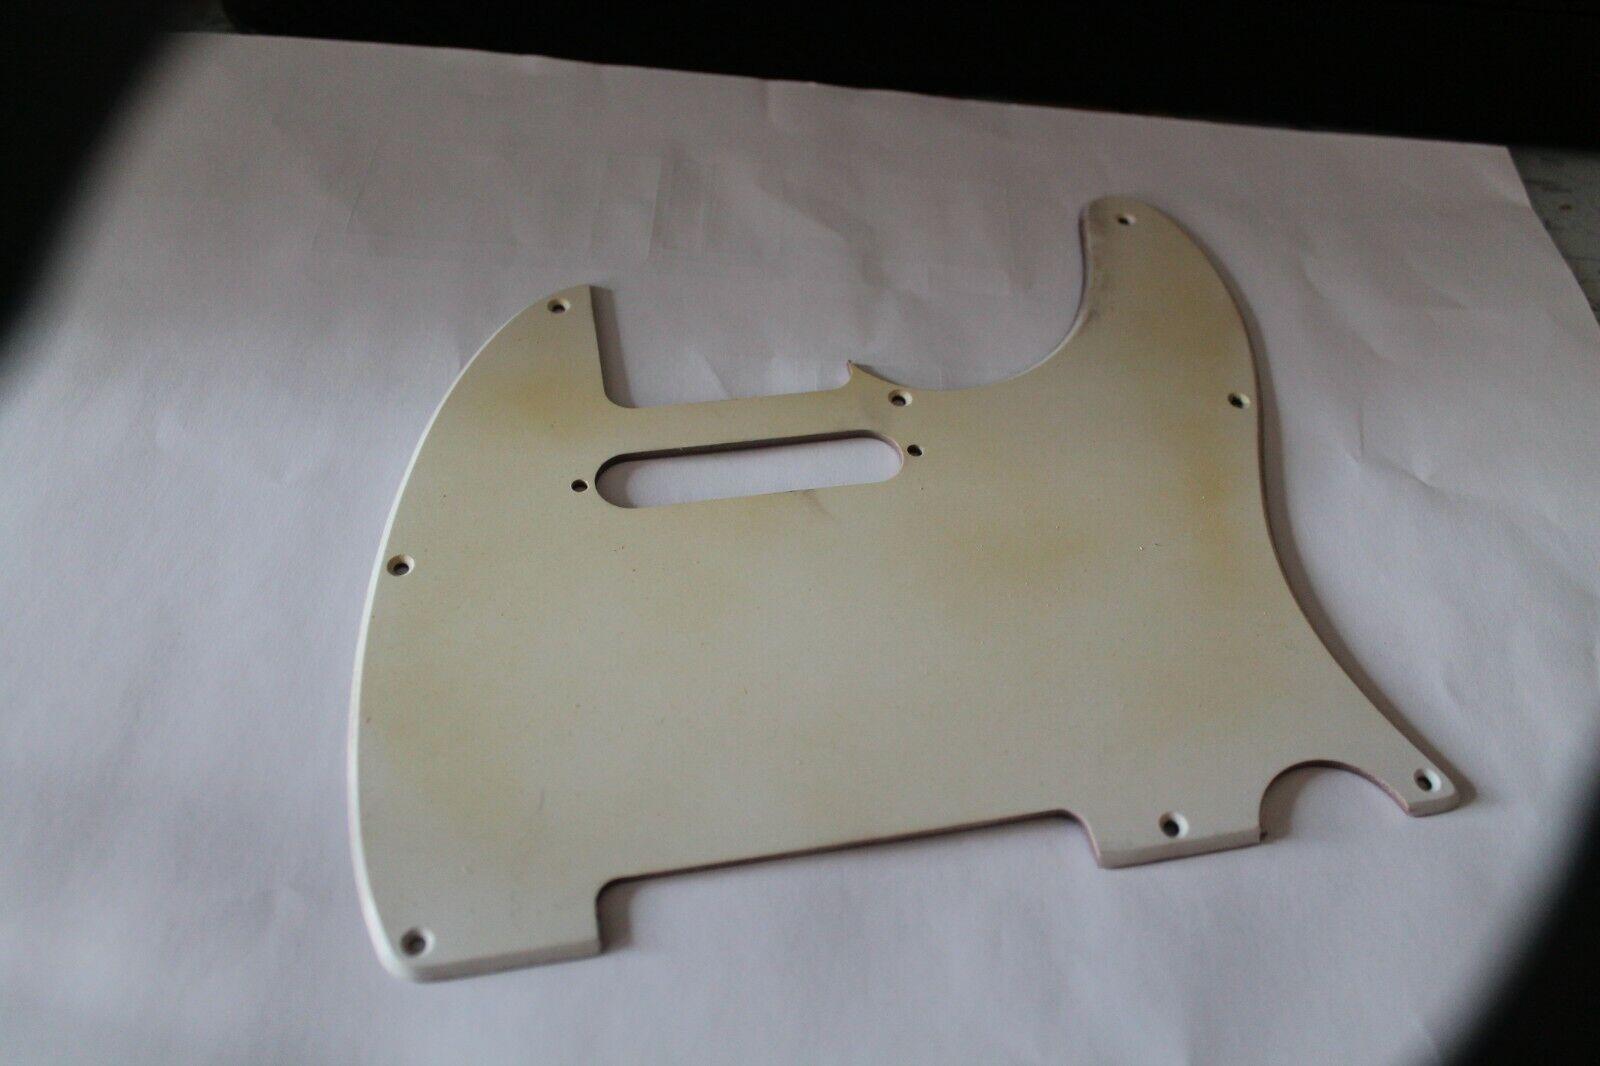 Pickguard Rohling Platte dreilagig sw creme sw ca 290 x 225 x 2,4 mm stark